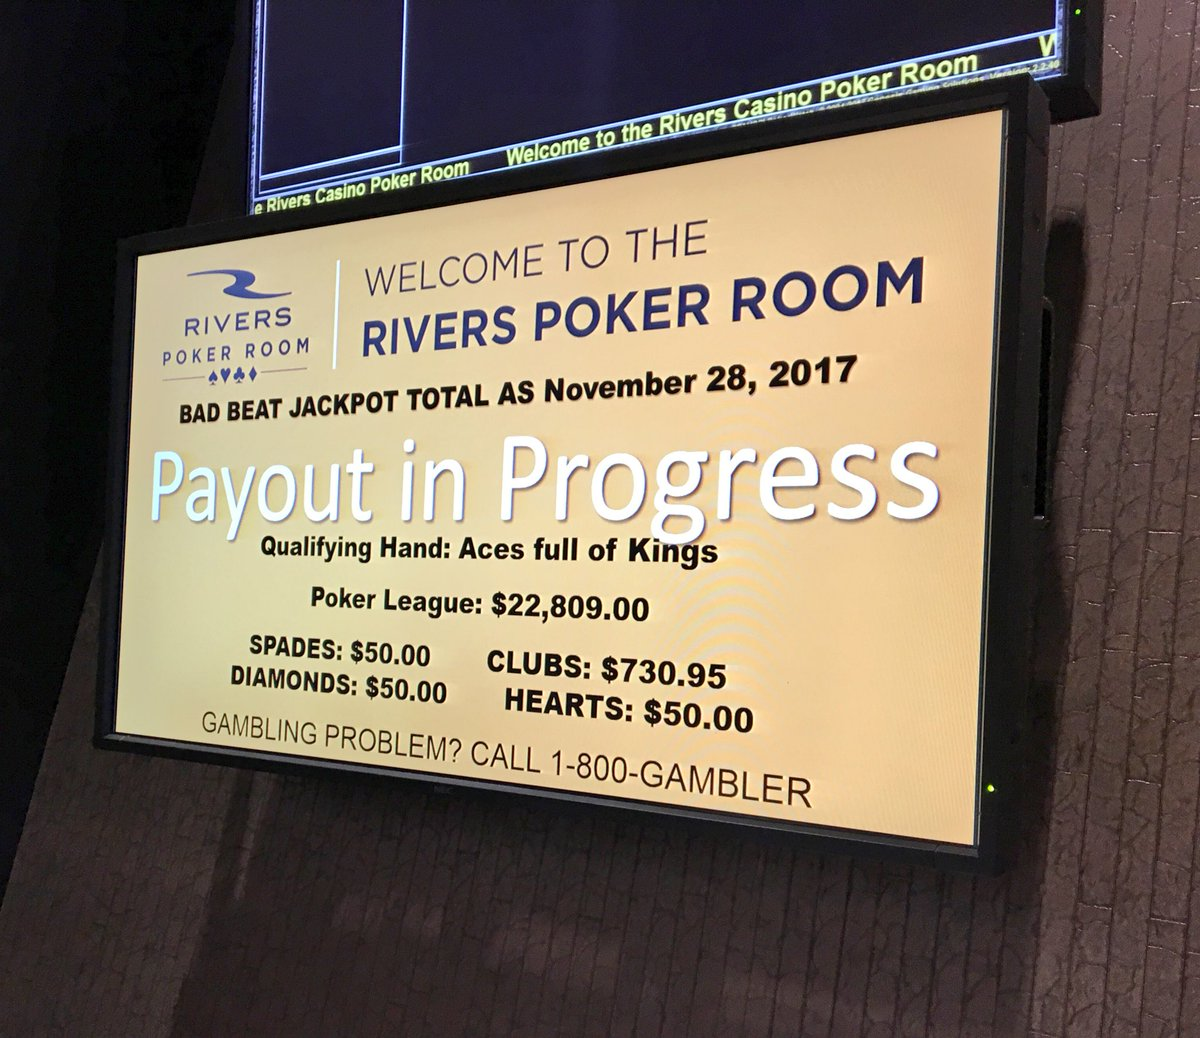 Rivers casino poker room bad beat poker in maui hawaii